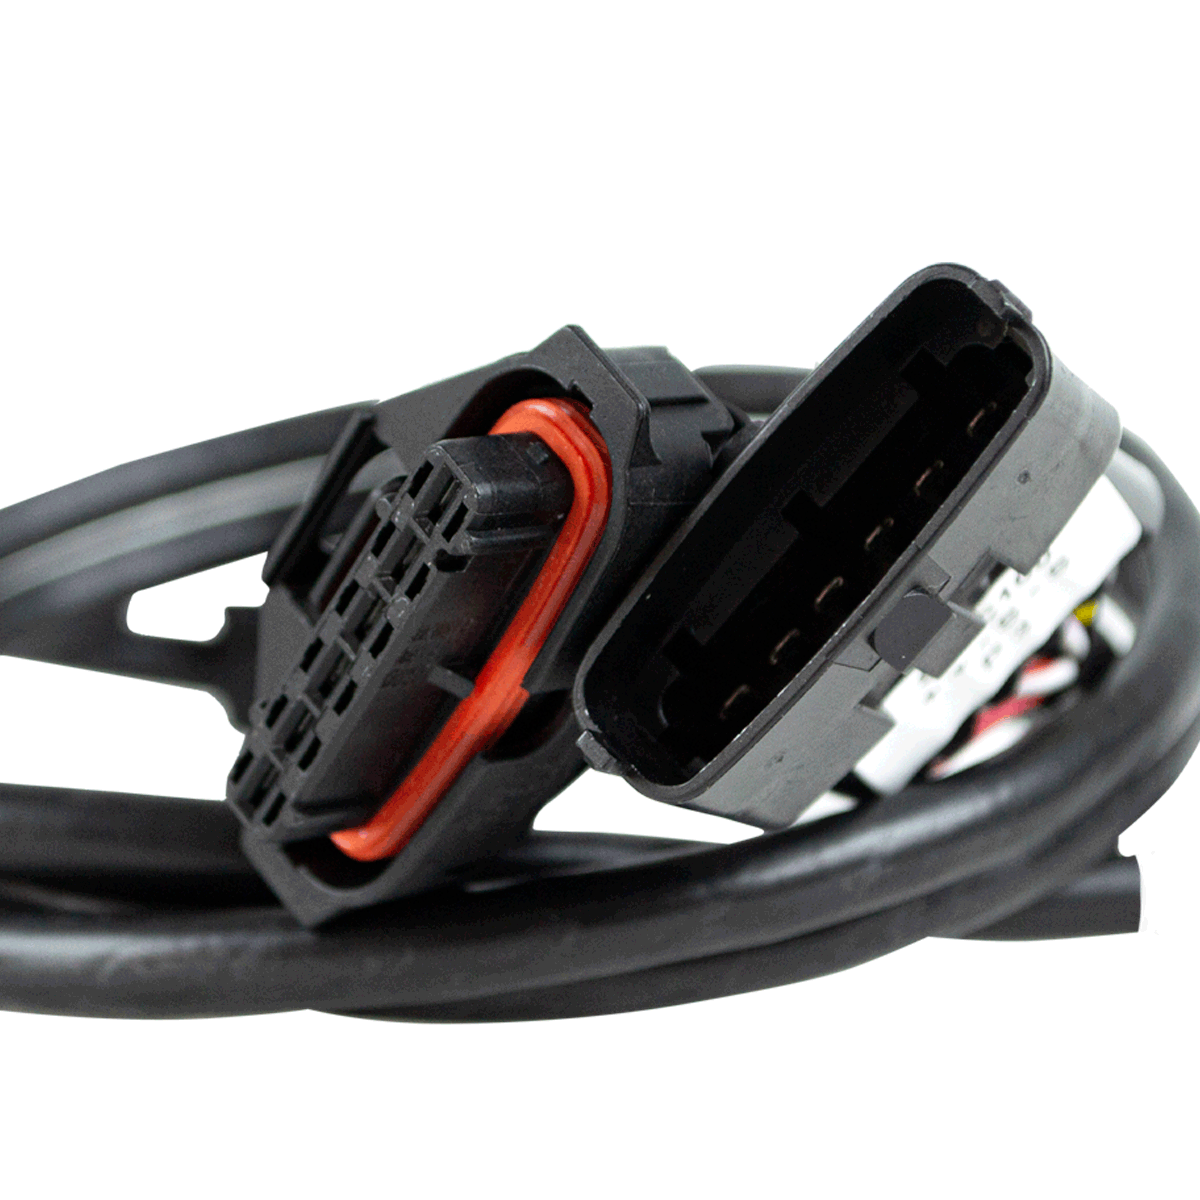 Chip De Potência Para Pedal Speedpro Para Fiat Bravo